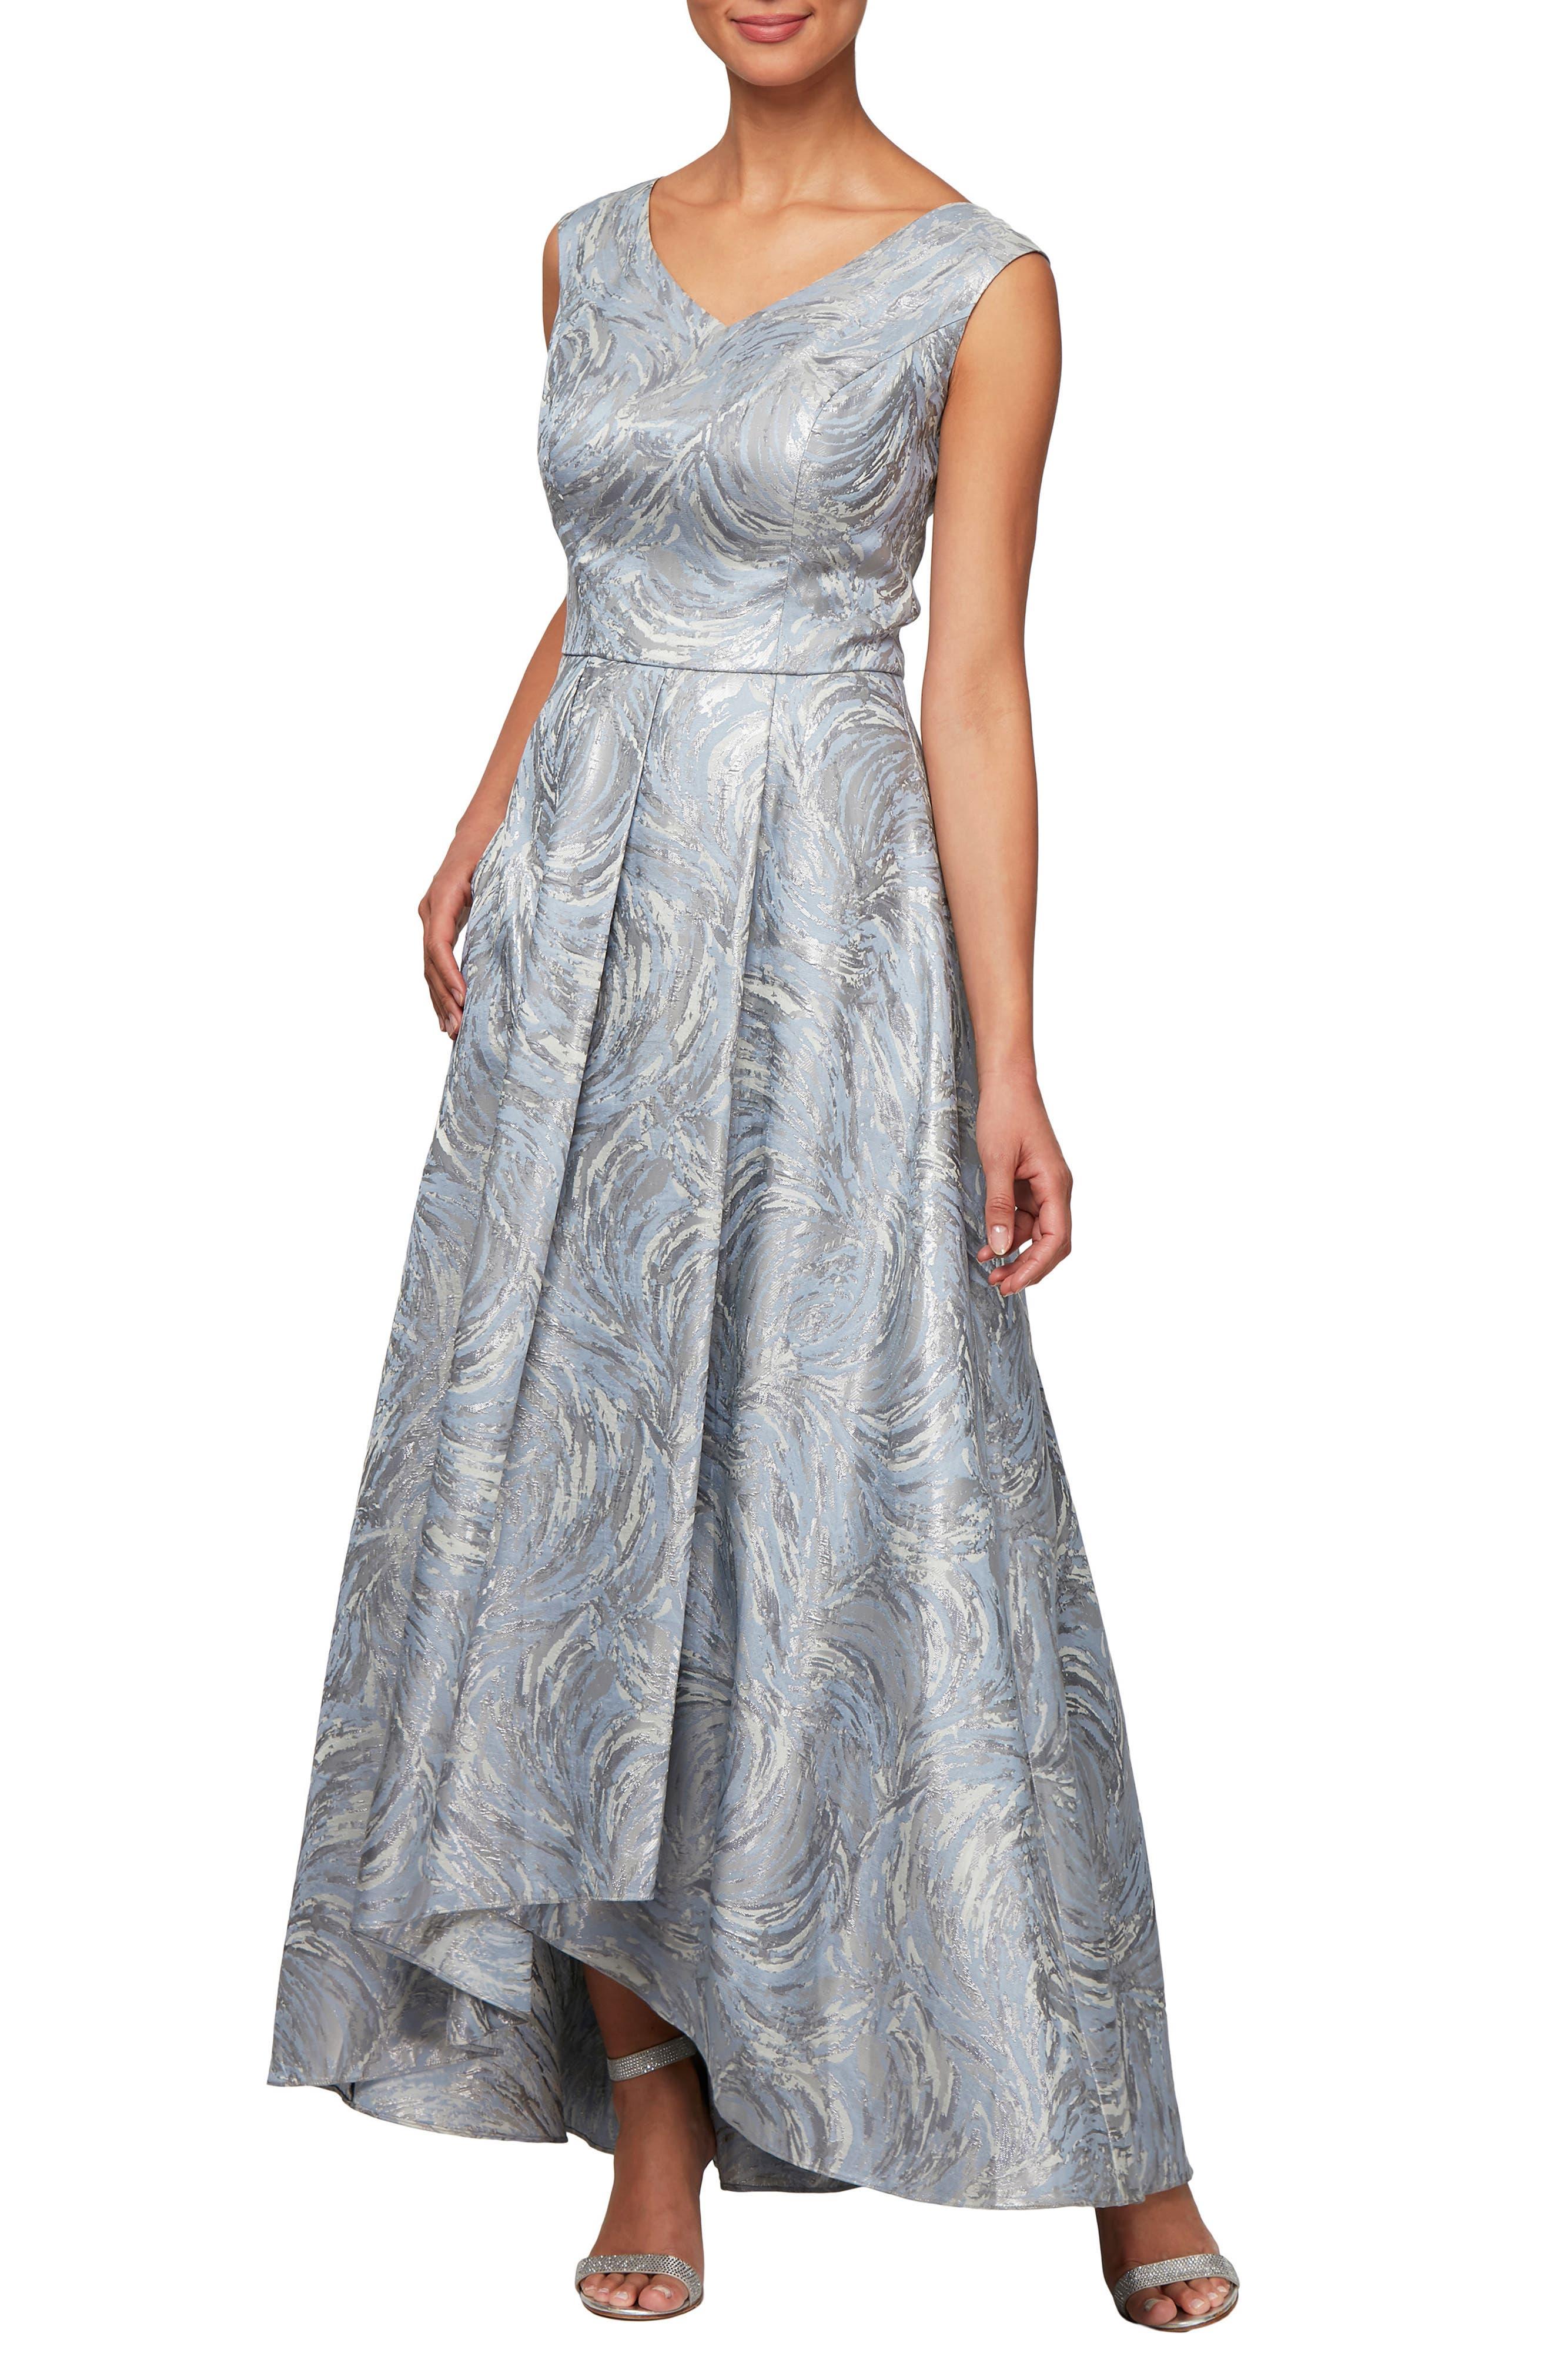 Alex Evenings Metallic Swirl High/low Evening Dress, Metallic